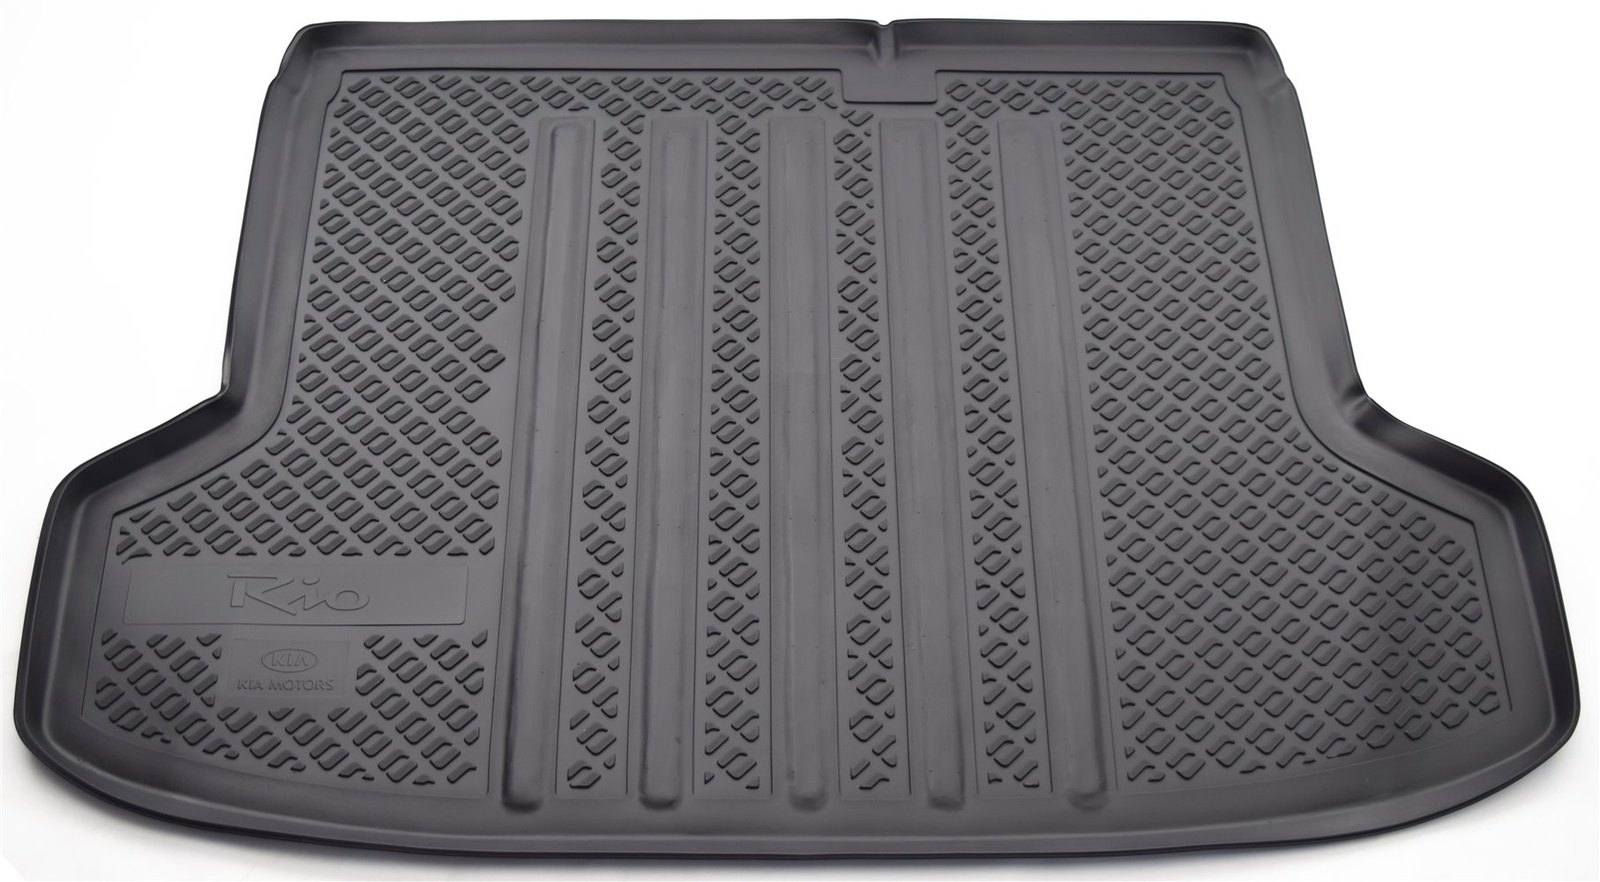 Коврик багажника Norplast для Kia Rio DE SD 2005-2011, NPL-P-43-35, черный